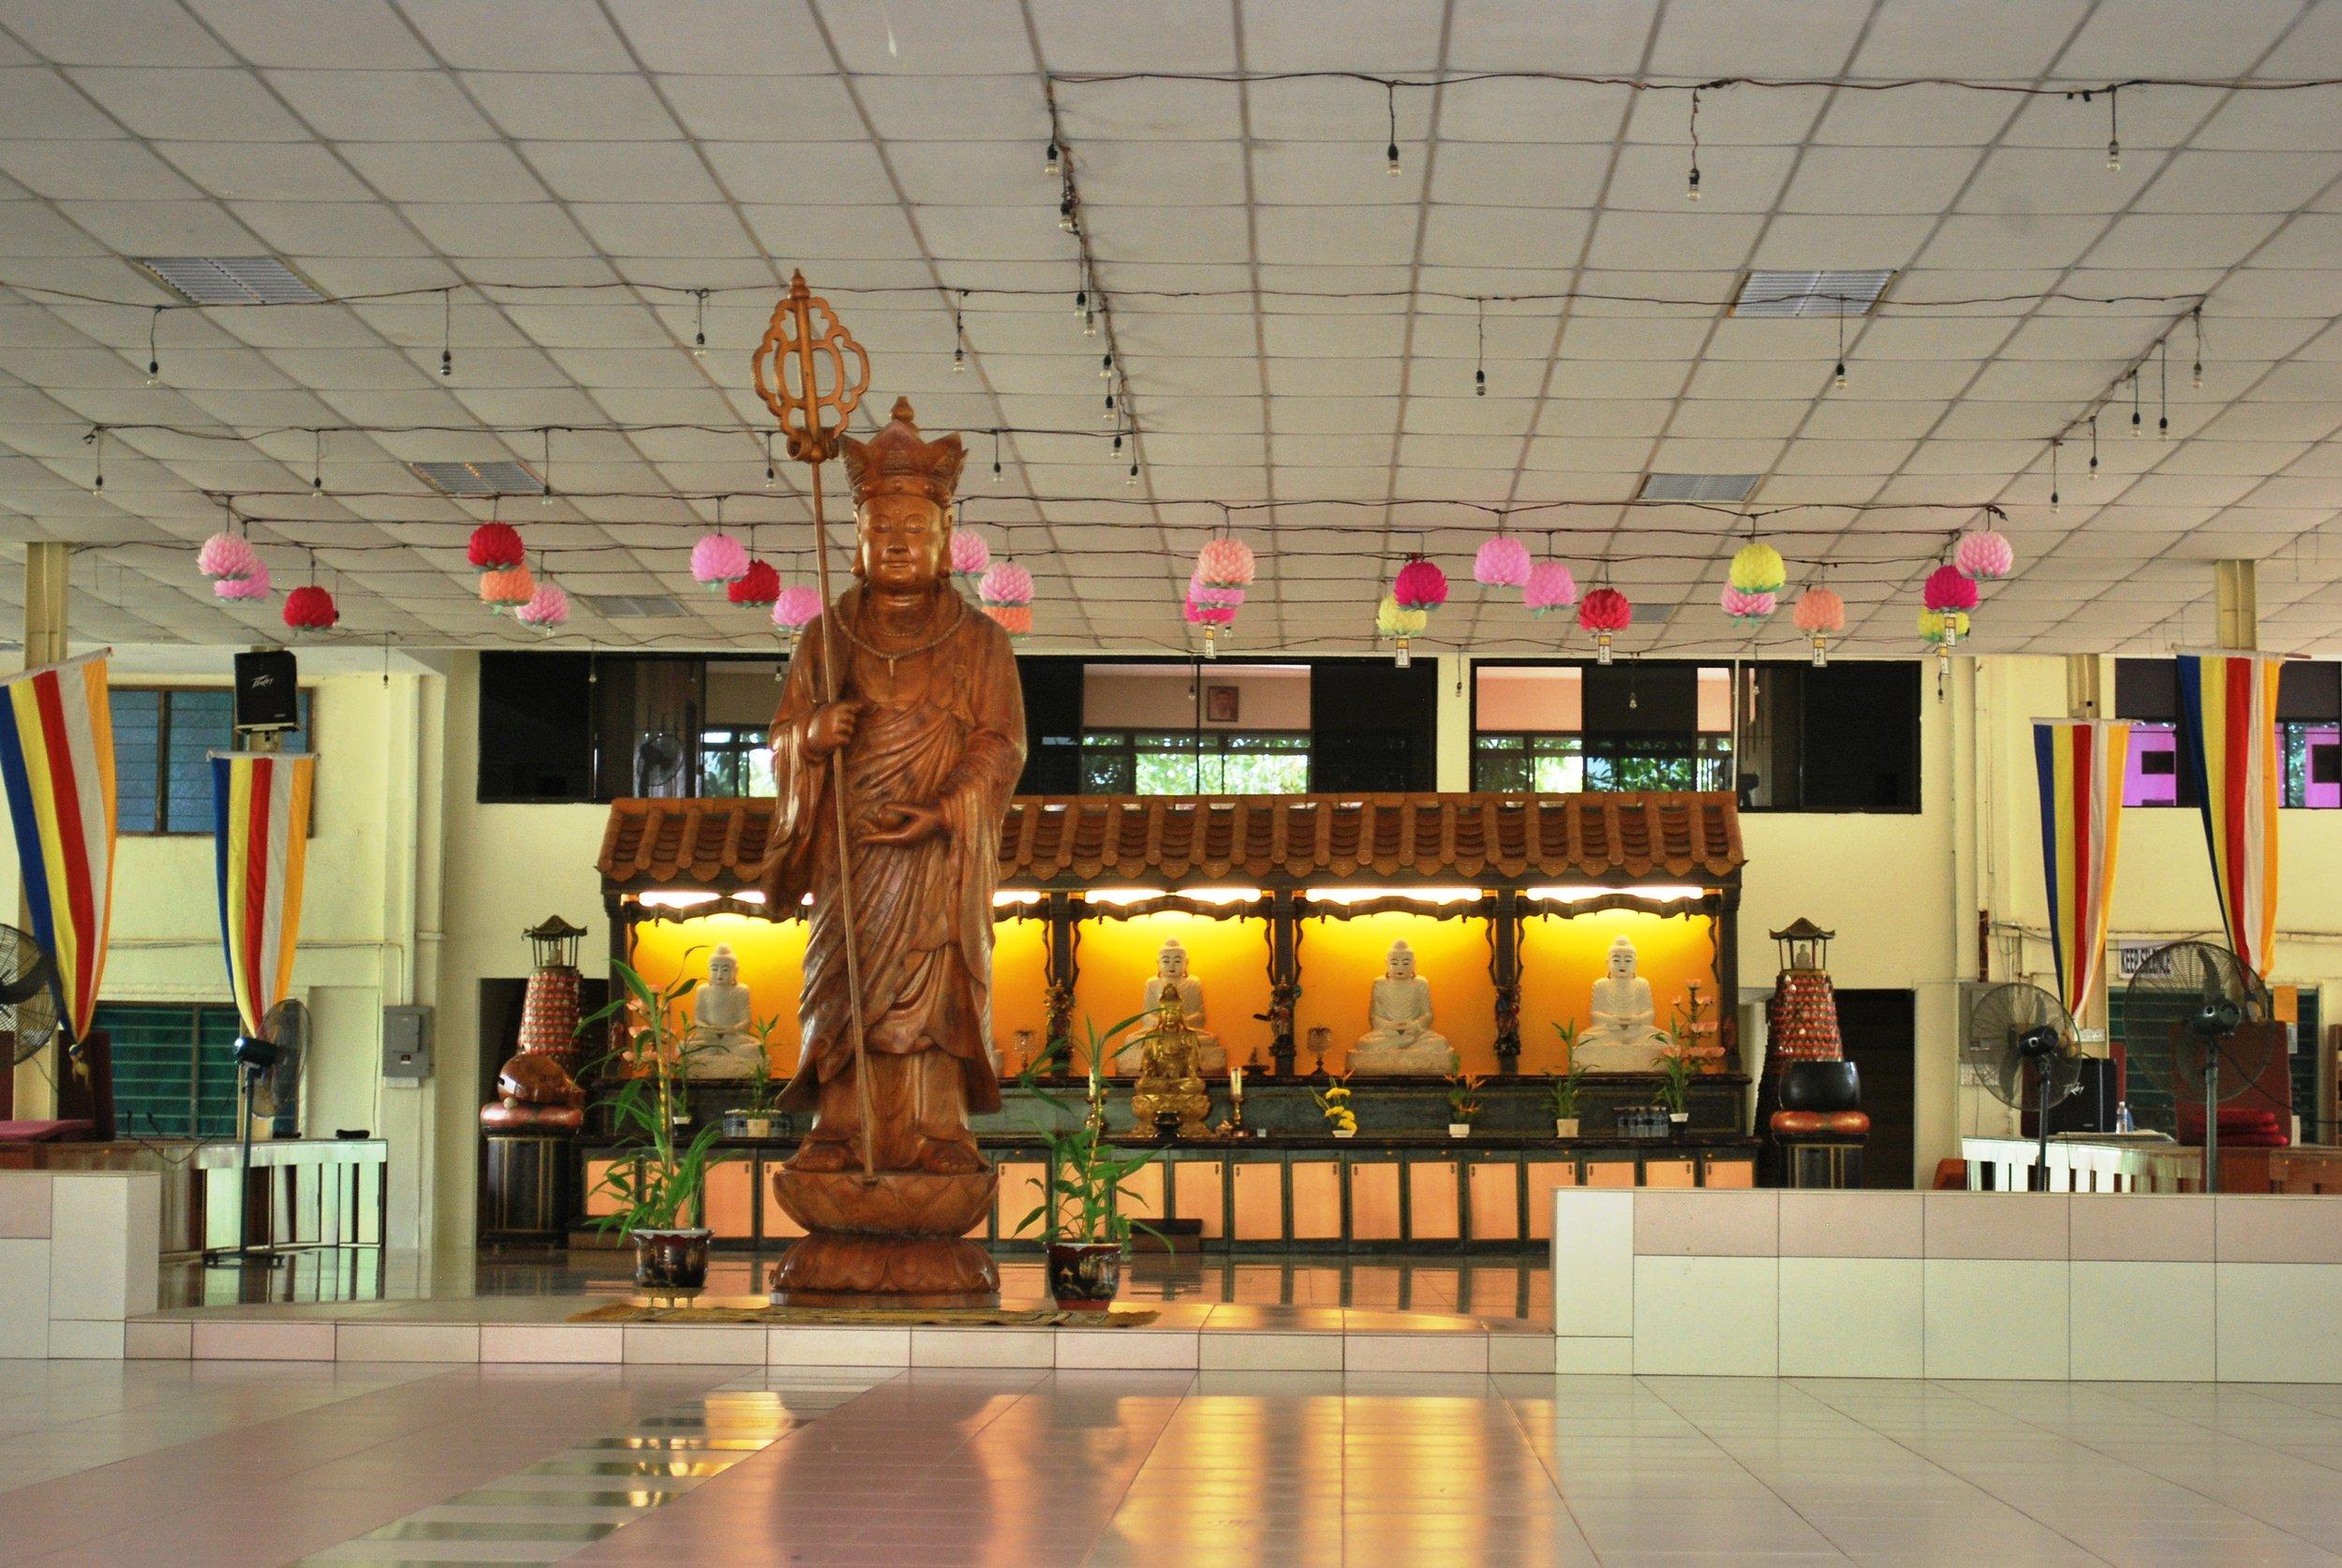 PIZC_buddha hall front 2.JPG